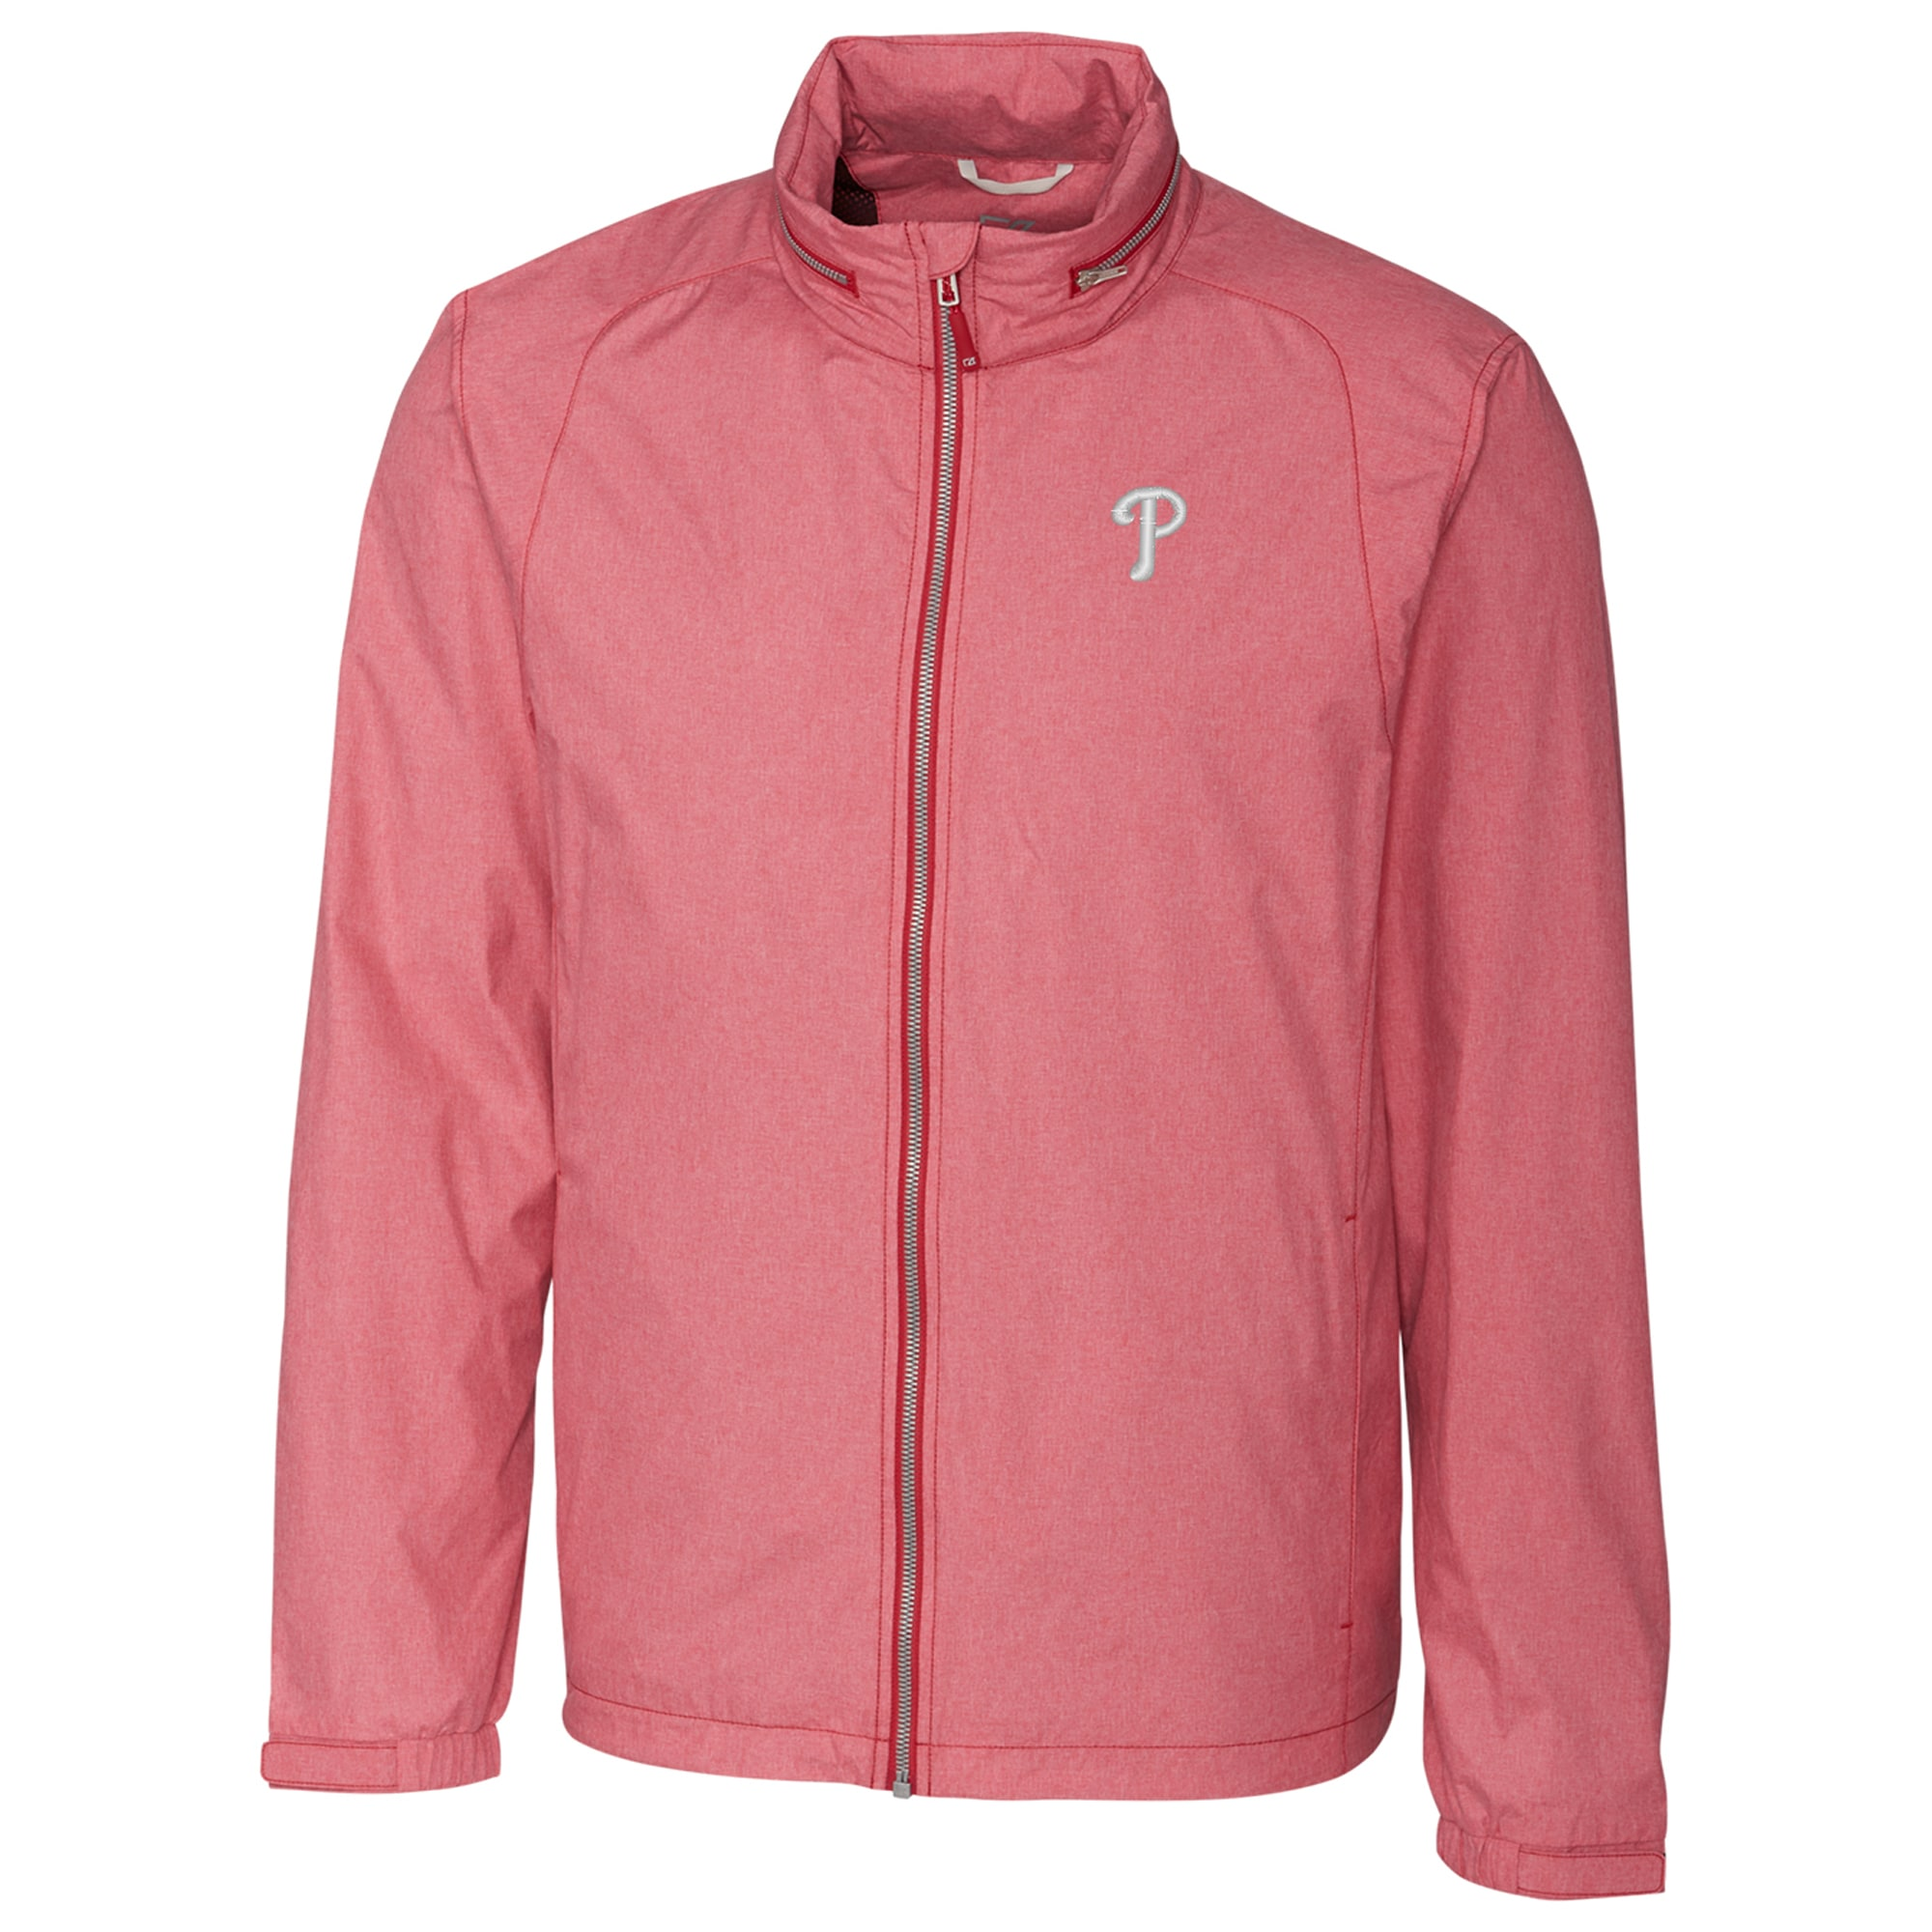 Philadelphia Phillies Cutter & Buck Panoramic Packable Full-Zip Jacket - Heather Red